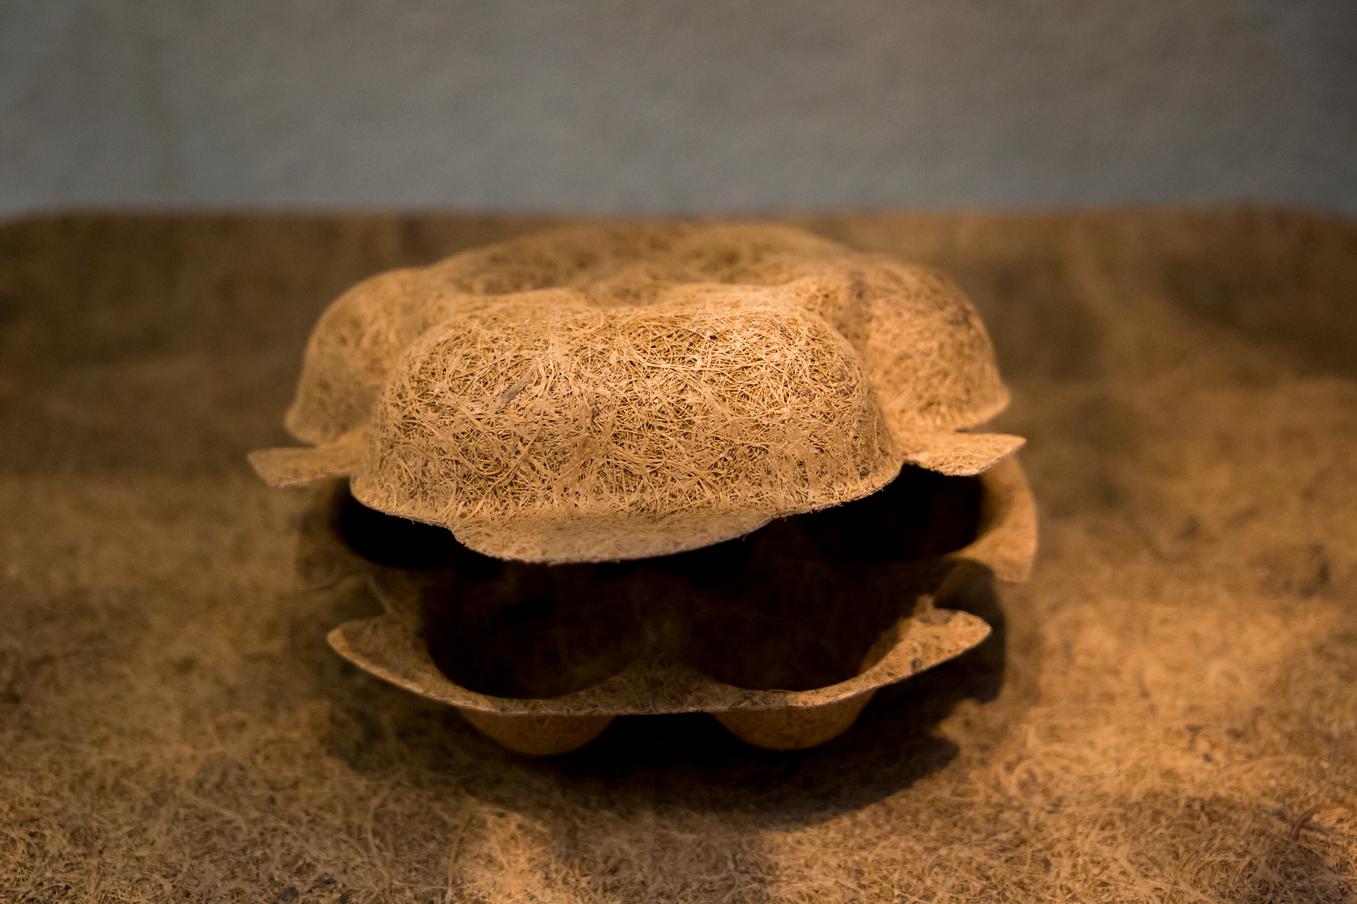 Image of Cocoform egg box